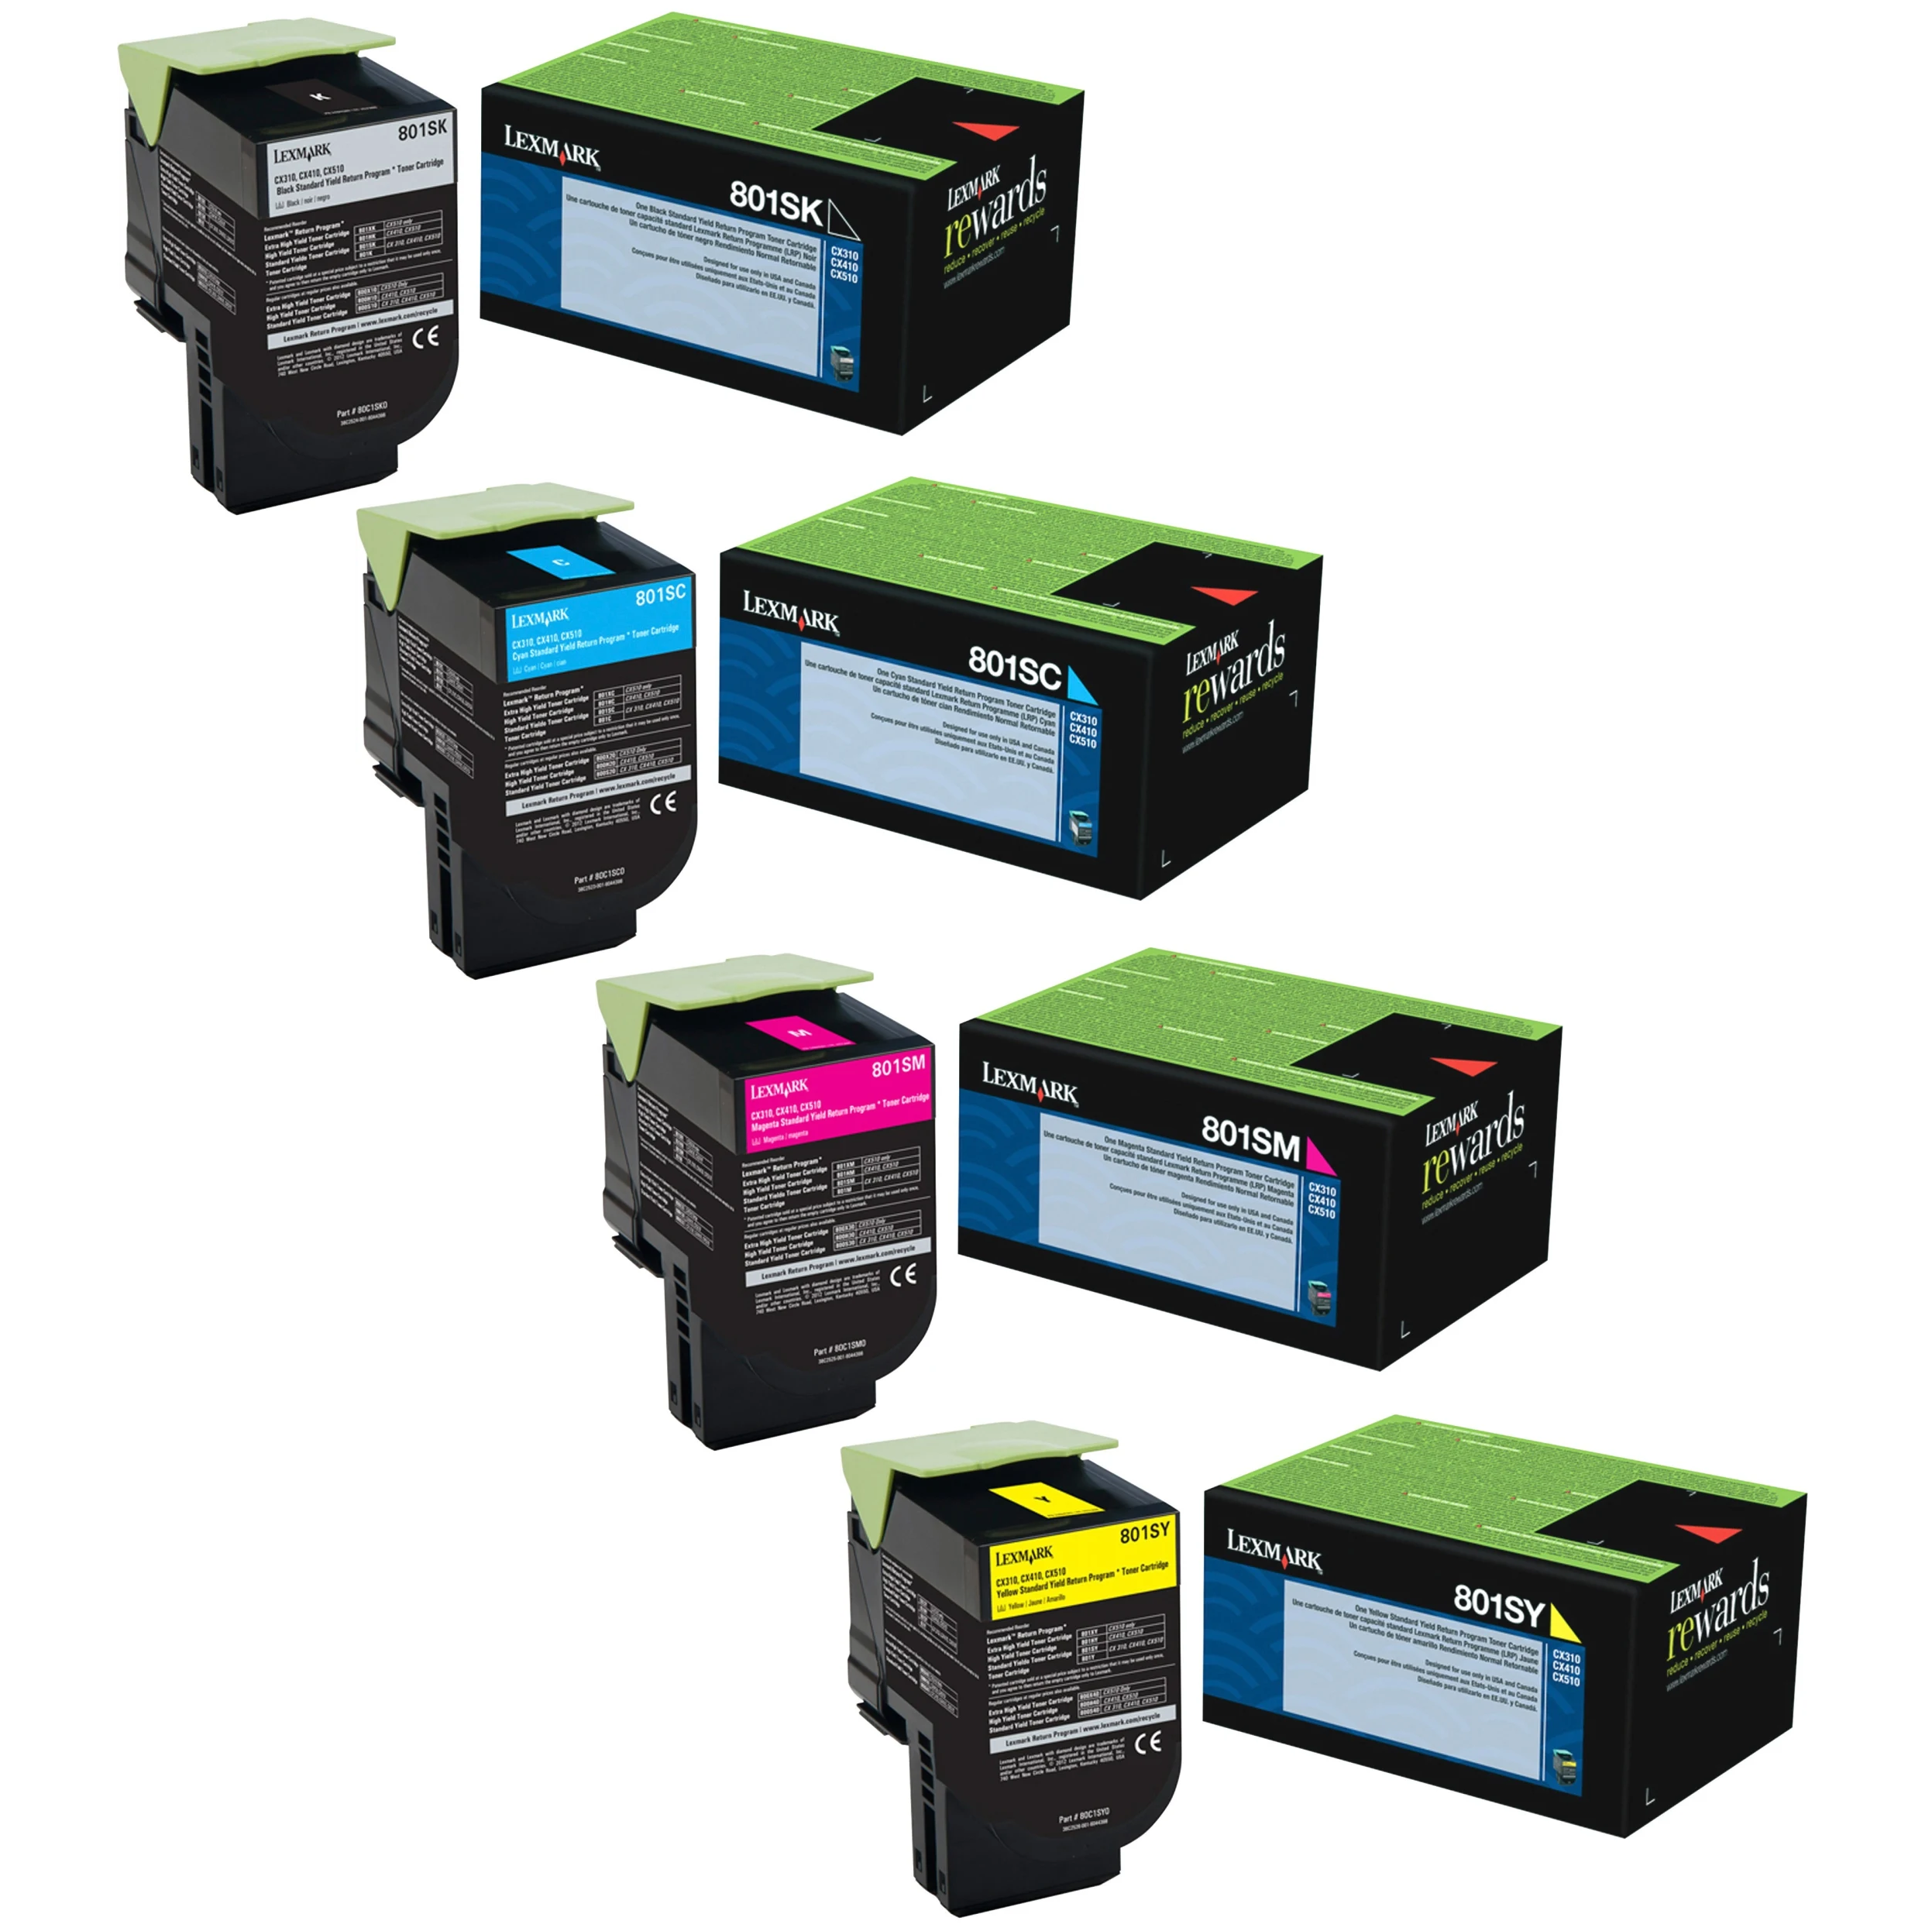 Lexmark 801S Set | 80C1SC0 80C1SK0 80C1SM0 80C1SY0 | Original Lexmark Toner Cartridges – Black, Cyan, Magenta, Yellow